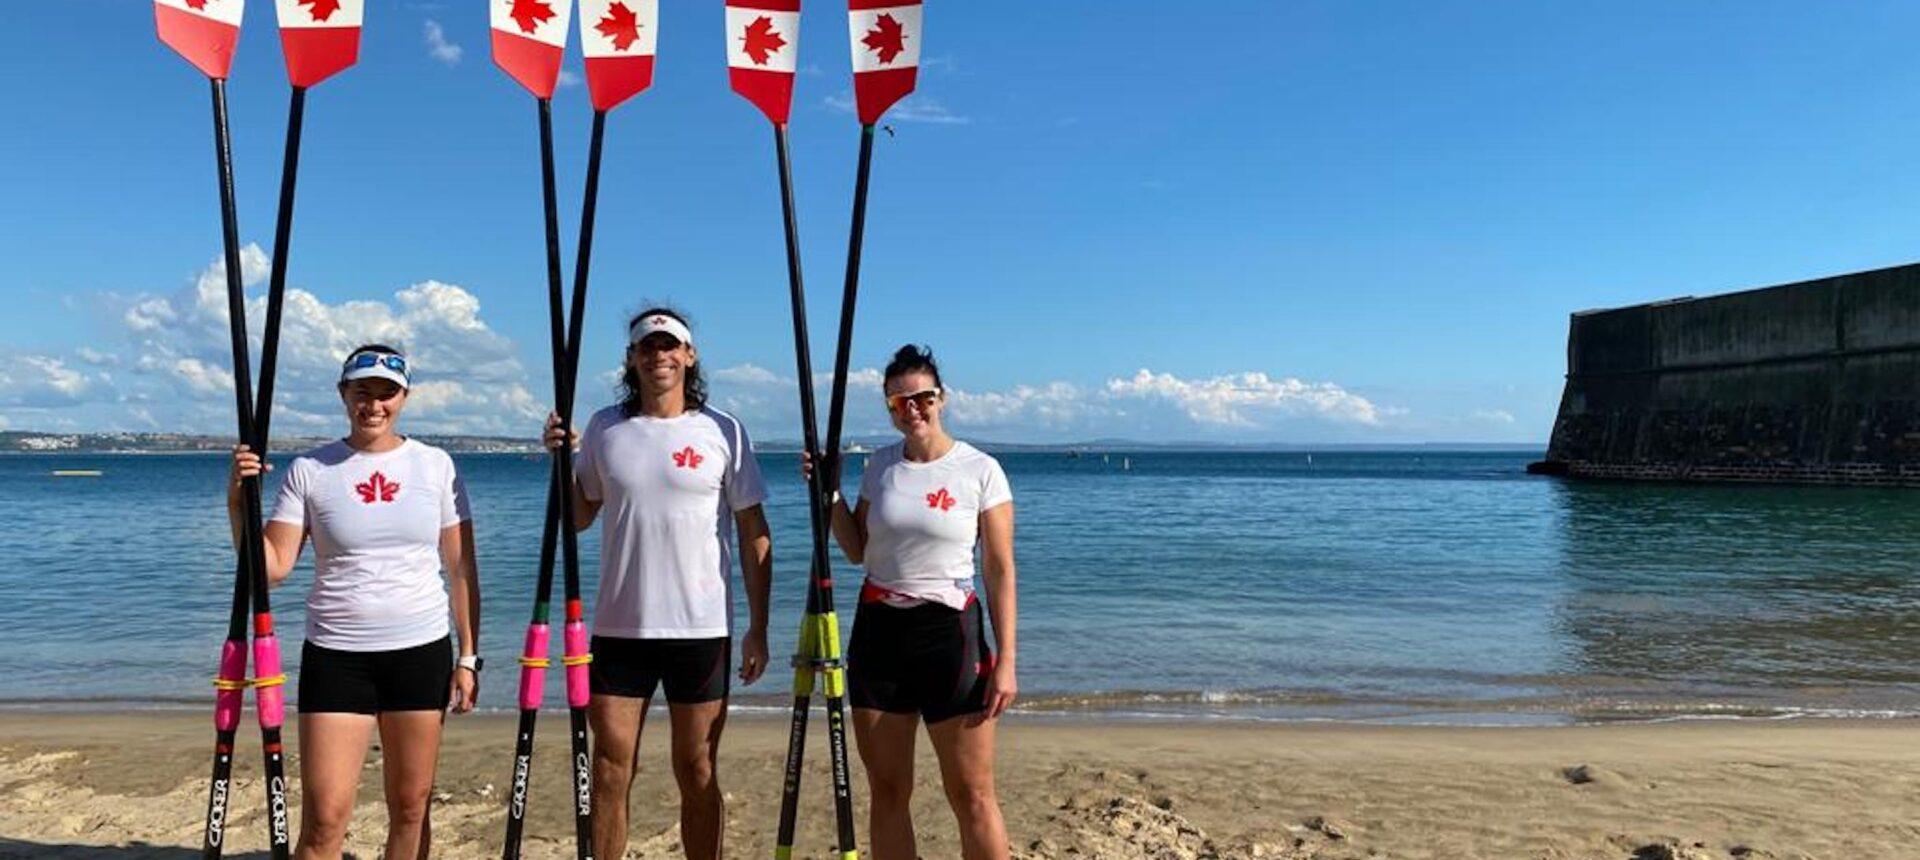 Brienne Miller wins Beach Sprints gold